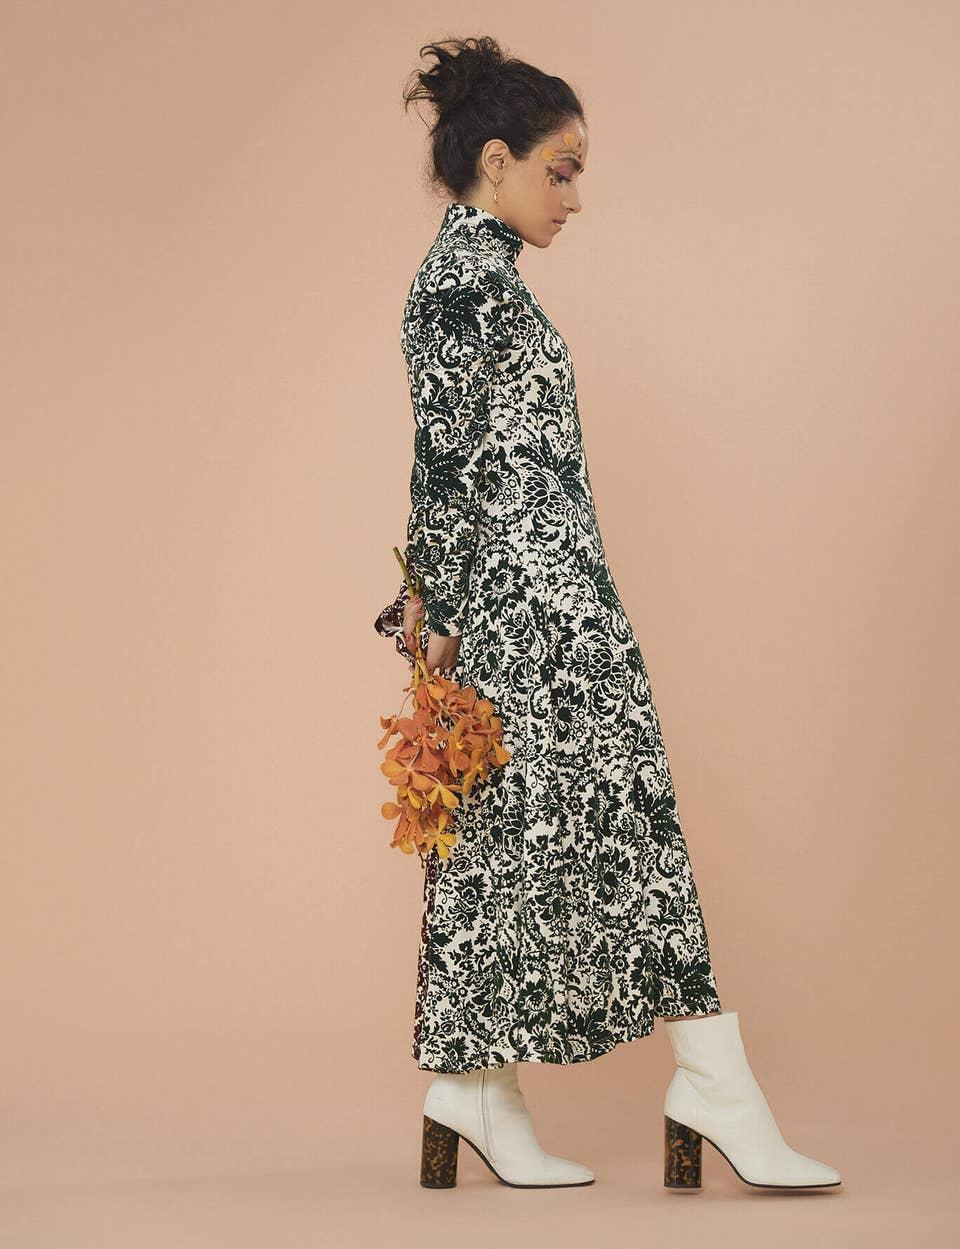 Female Wedding Guest Attire What To Wear By Dress Code,Wedding Beautiful Night Dress